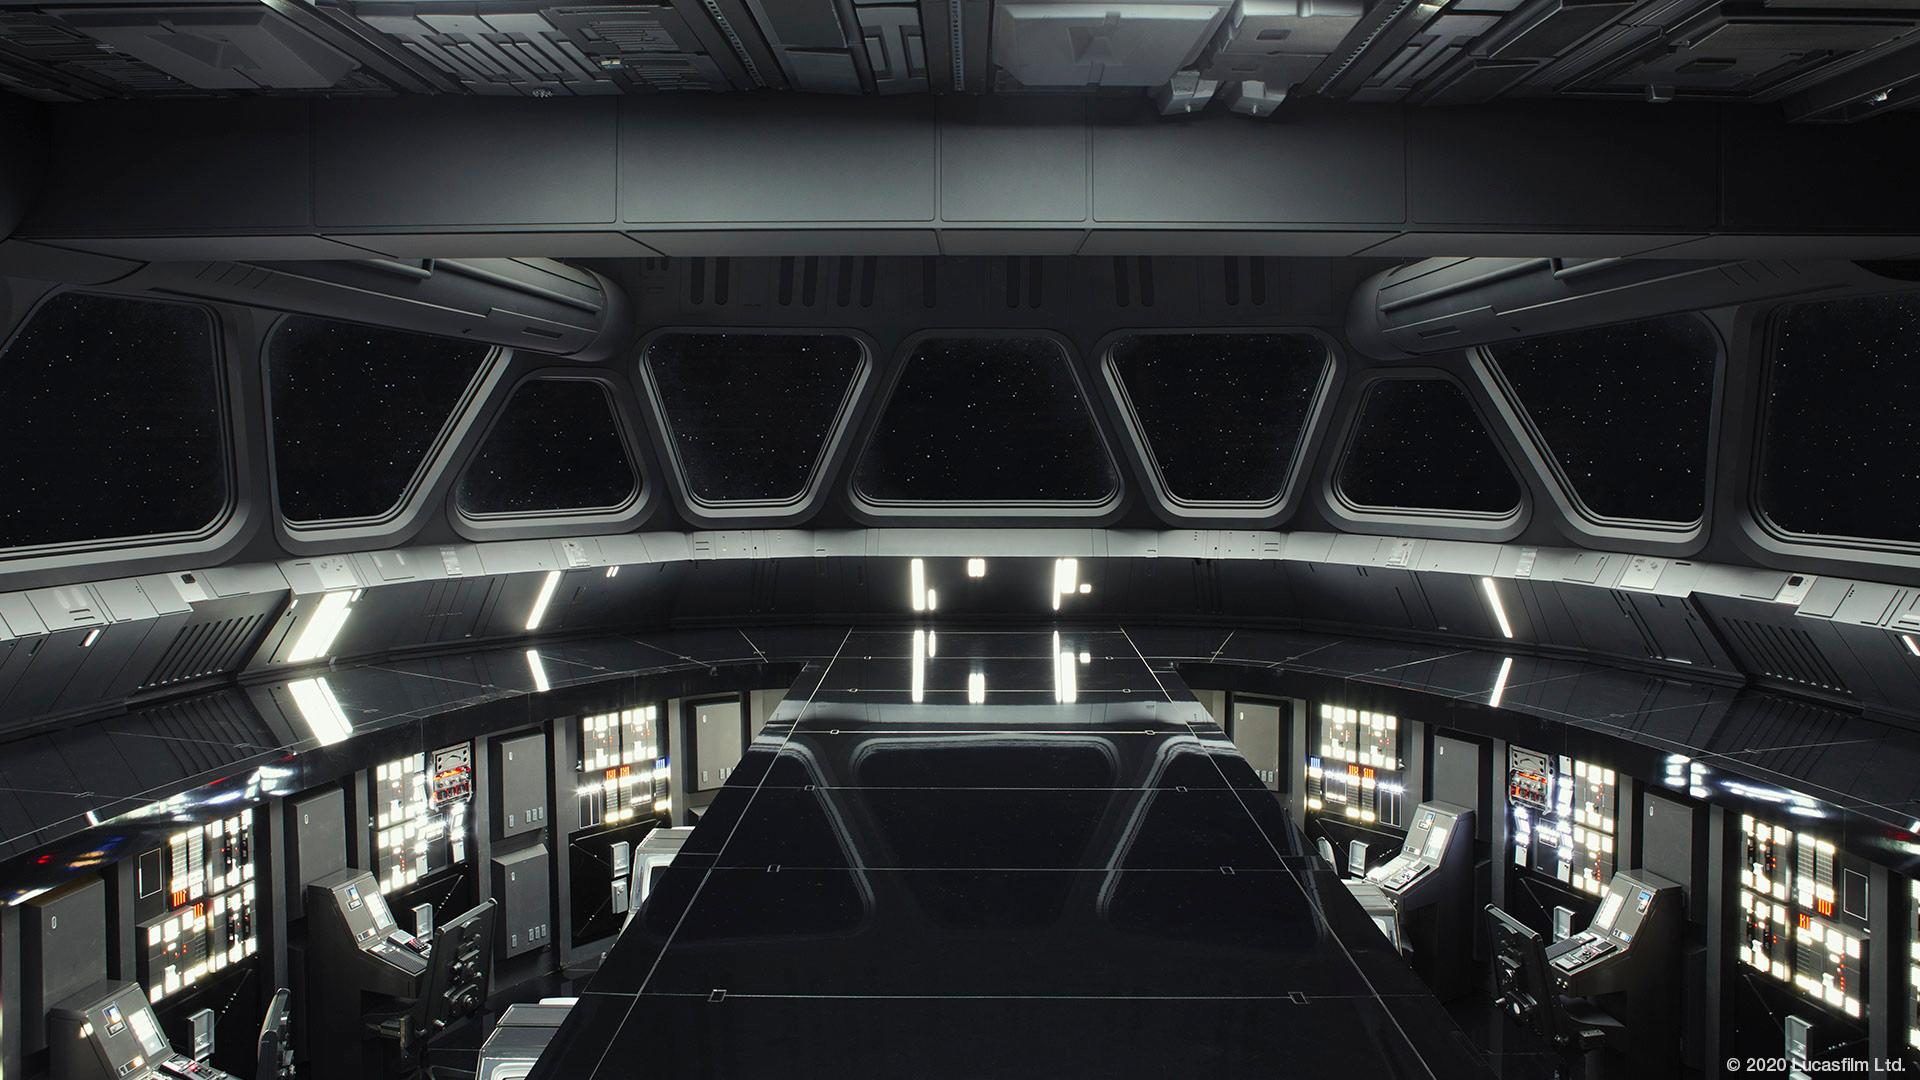 Ponte da Destroier Estelar Classe Imperial